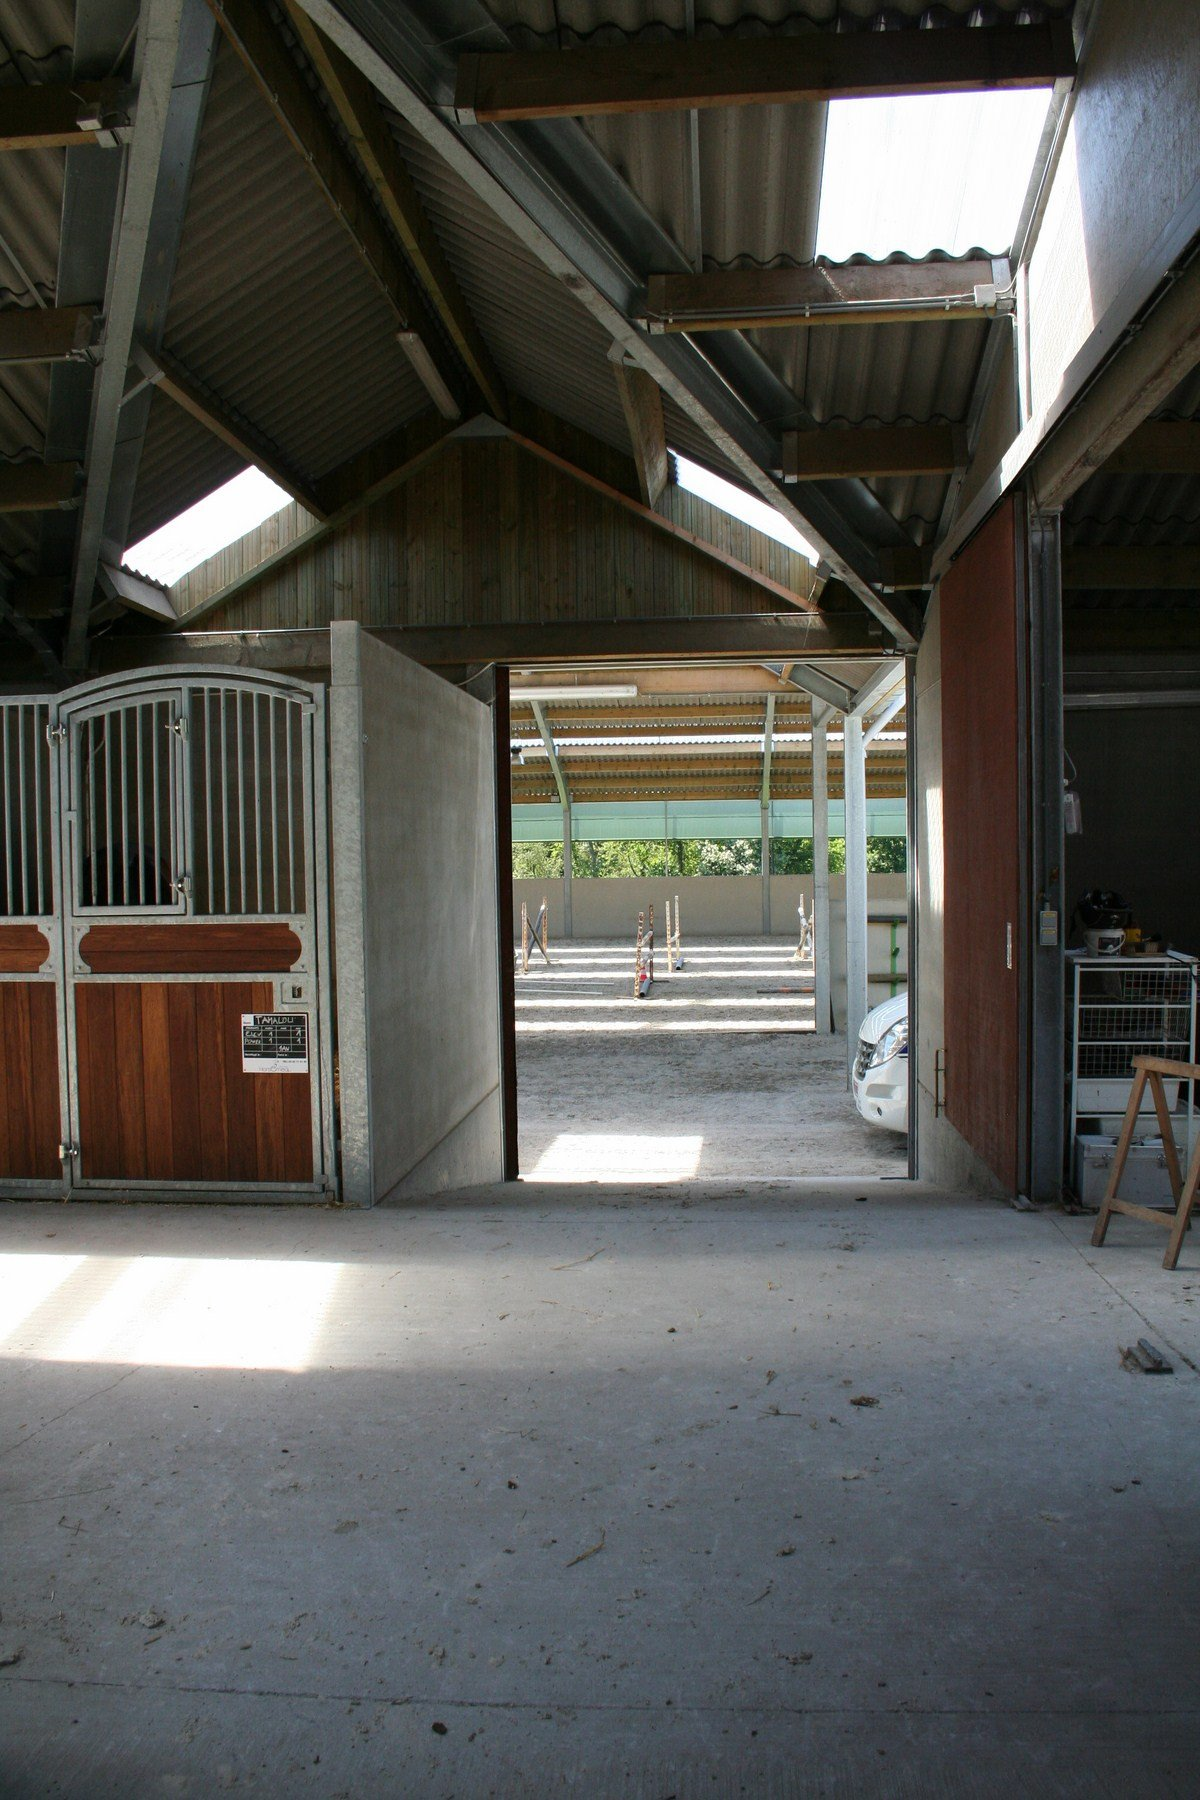 saint hermelle_paardenstallen_paardenboxen_binnenpiste_gouy les Pieton (16)